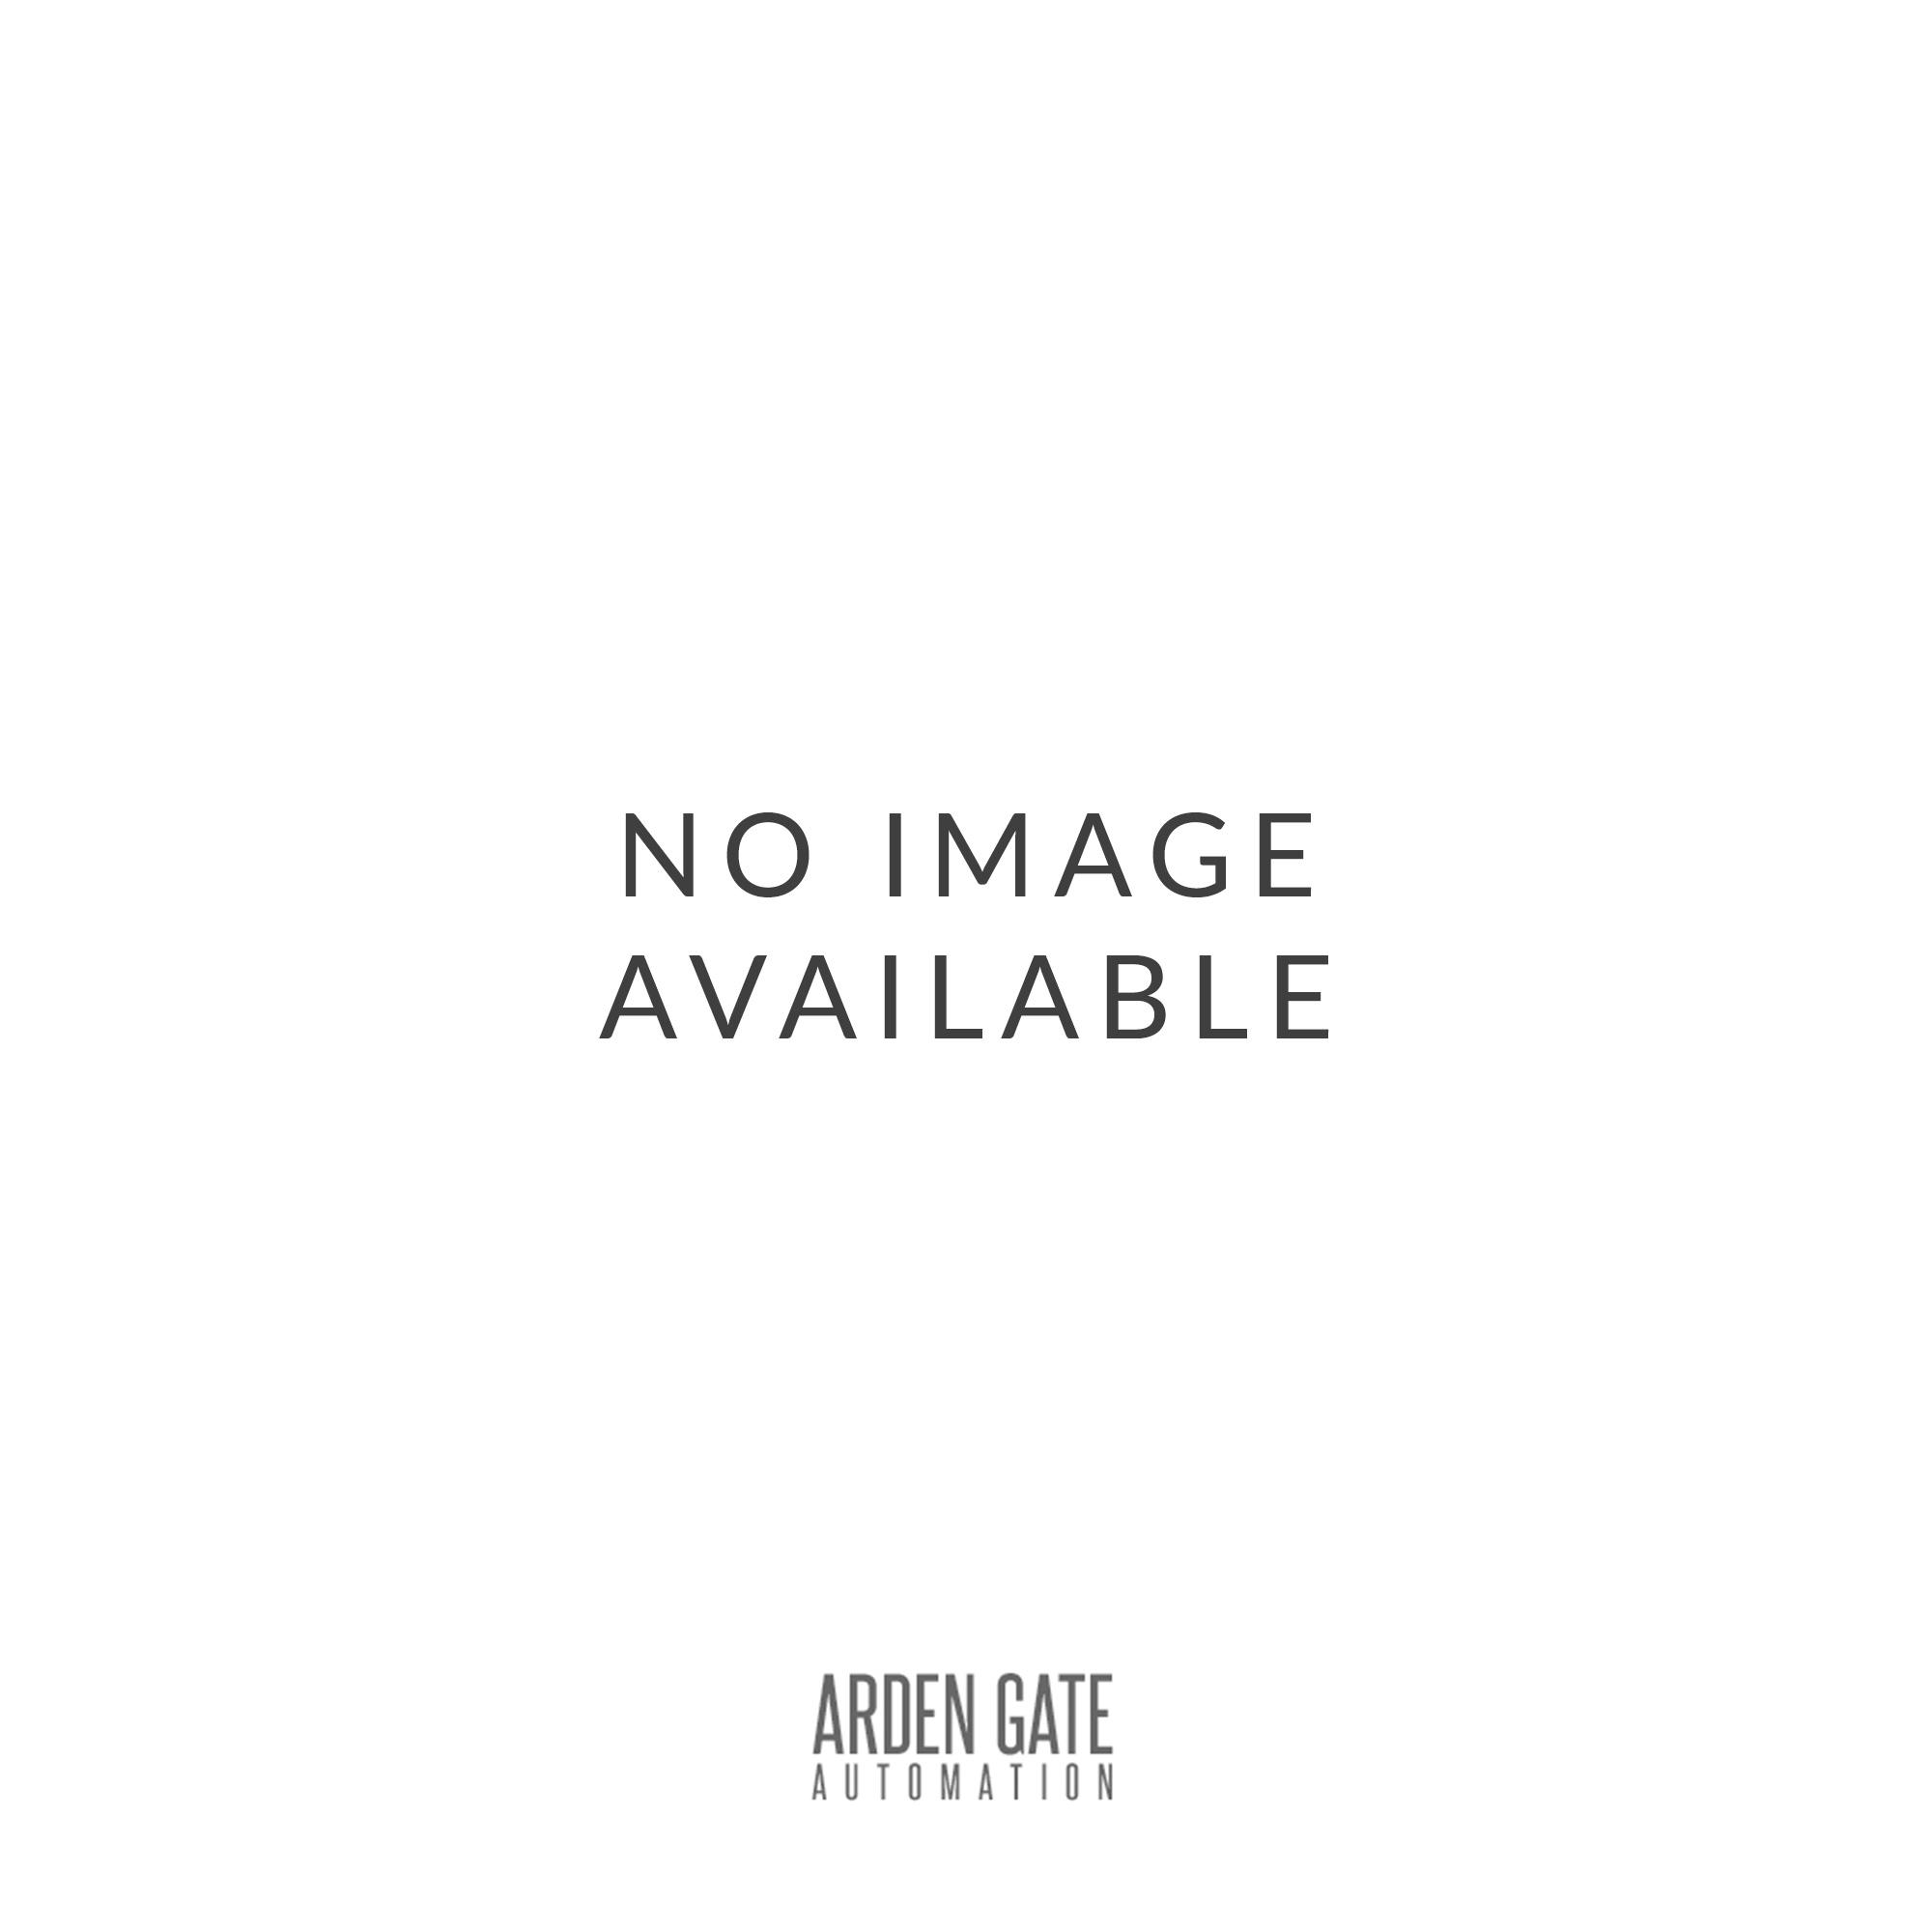 578 D control board